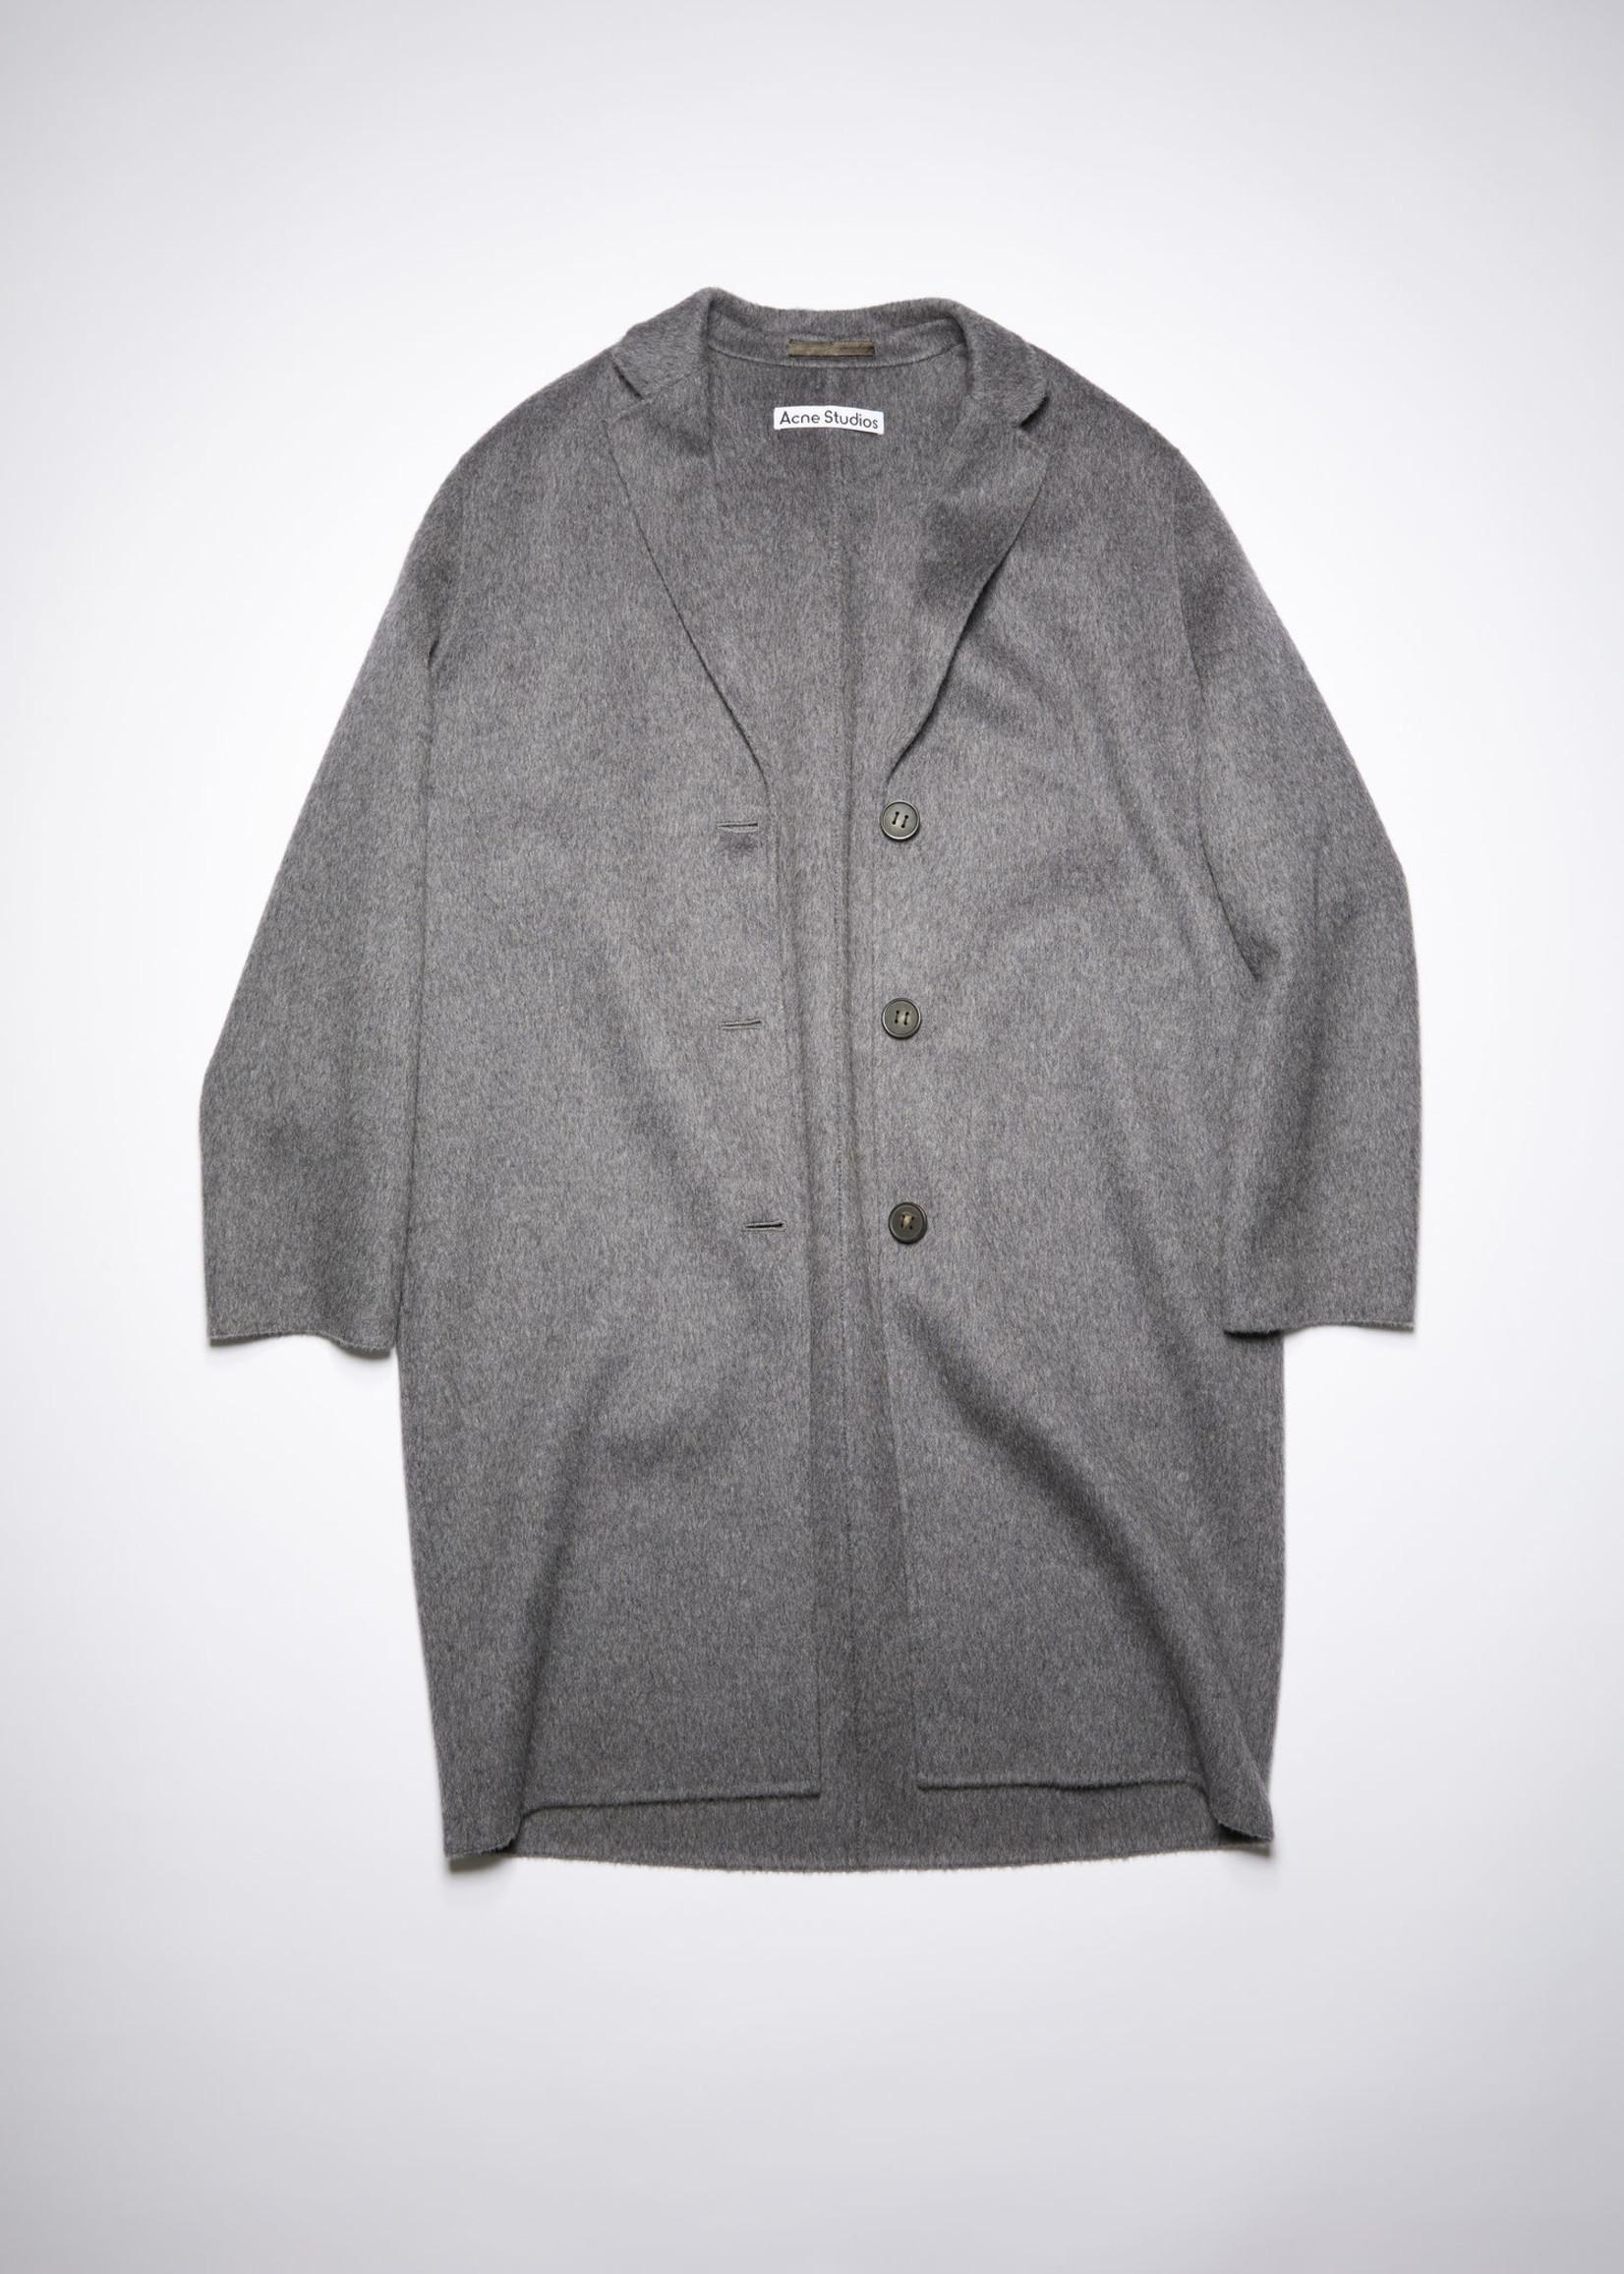 Acnestudios Acnestudios wool coat grey melange 38